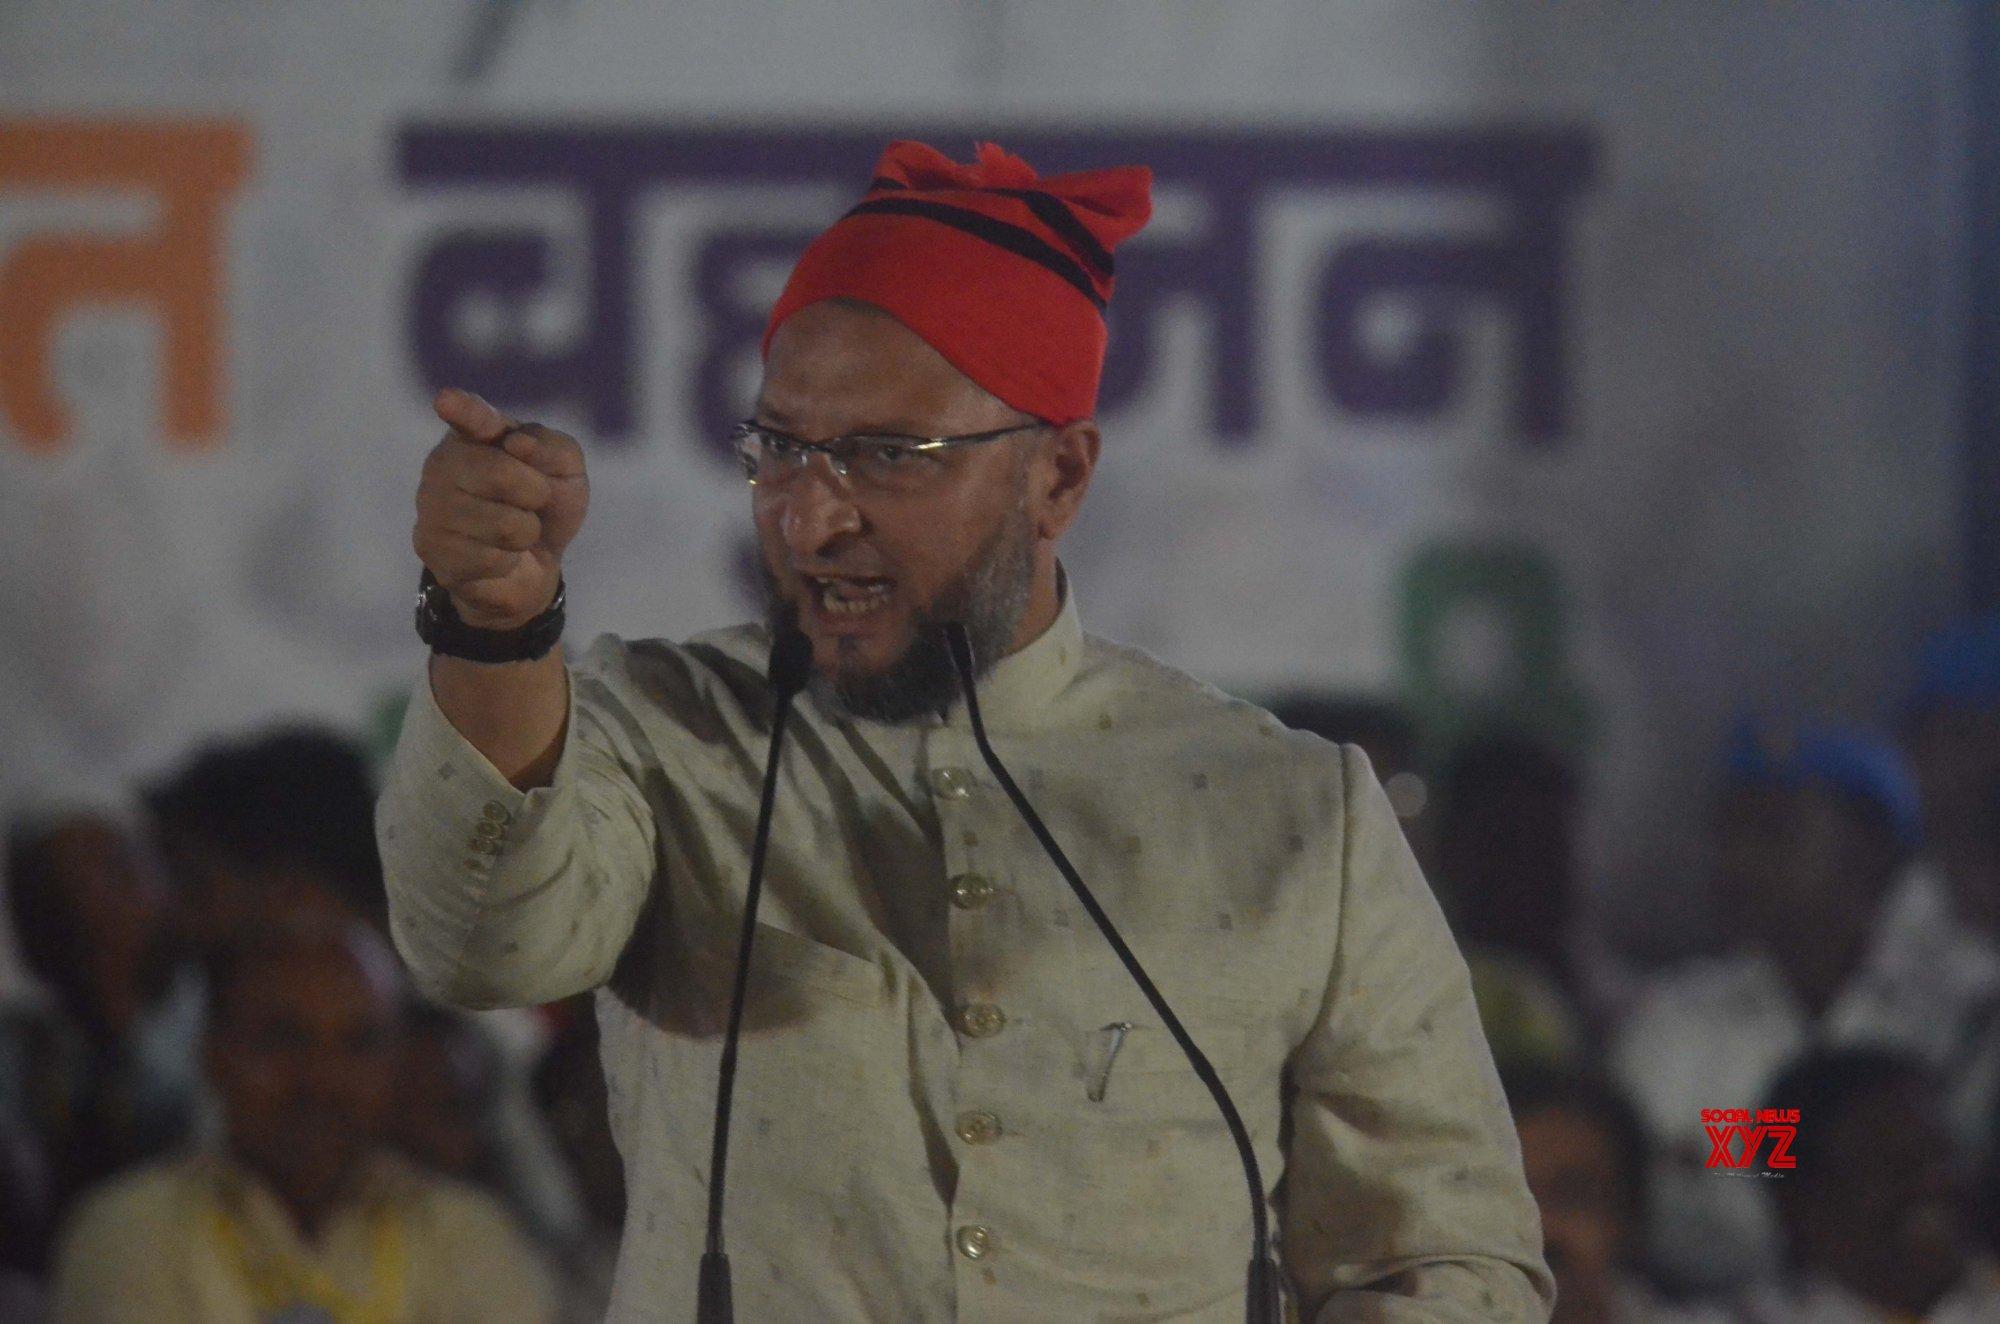 Mumbai: BBM leader Prakash Ambedkar, Asaduddin Owaisi's rally for